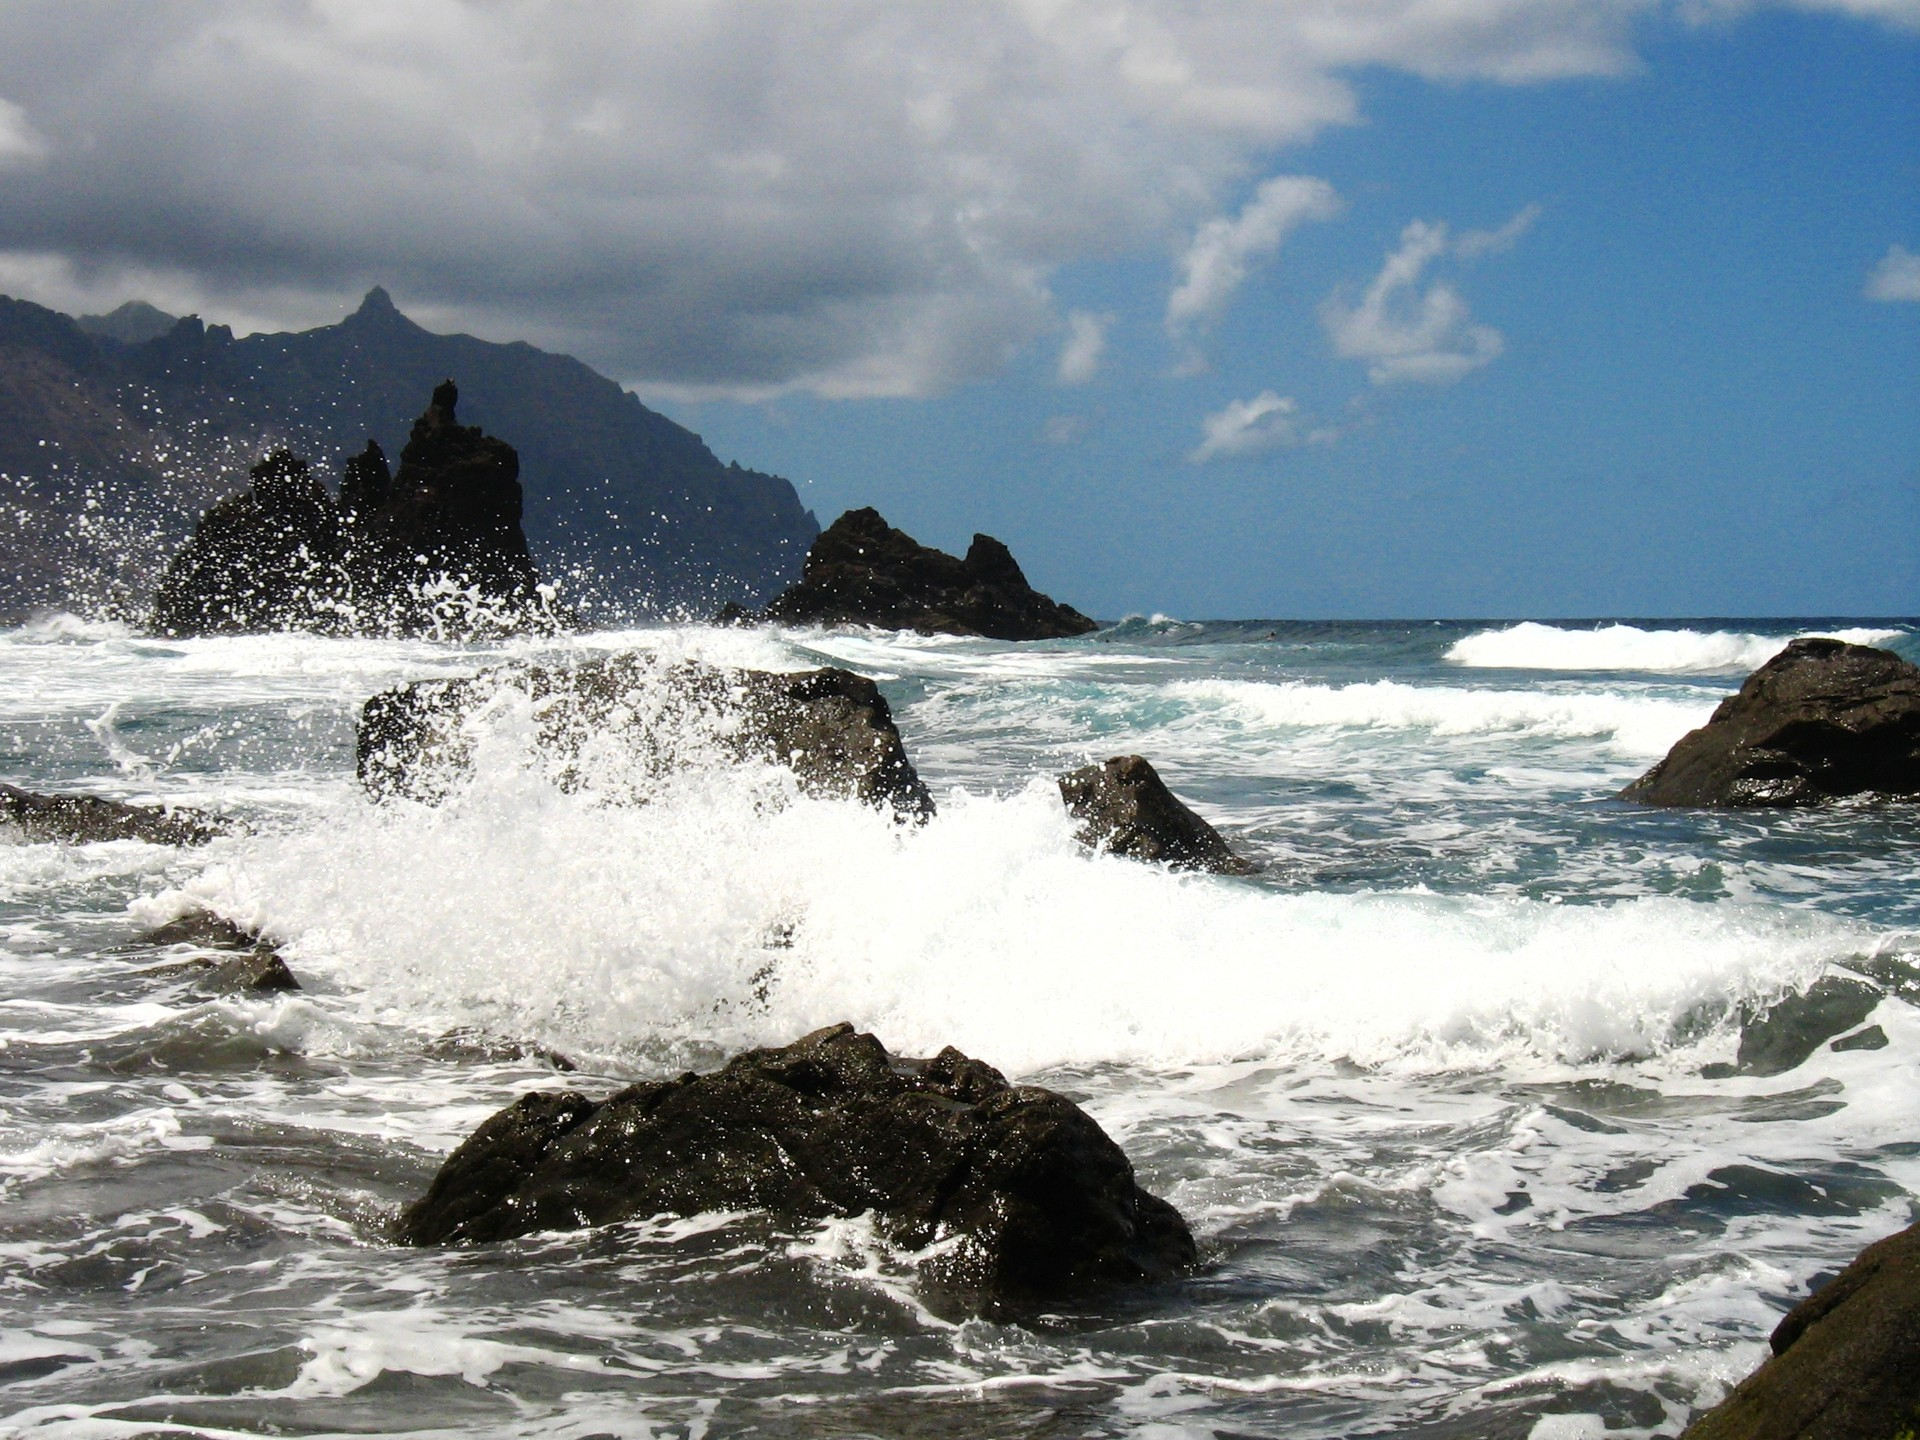 Mar abrangia também Bahia, Goiás, Tocantins e Distrito Federal (Foto: perlaroques/flickr/creative commons)